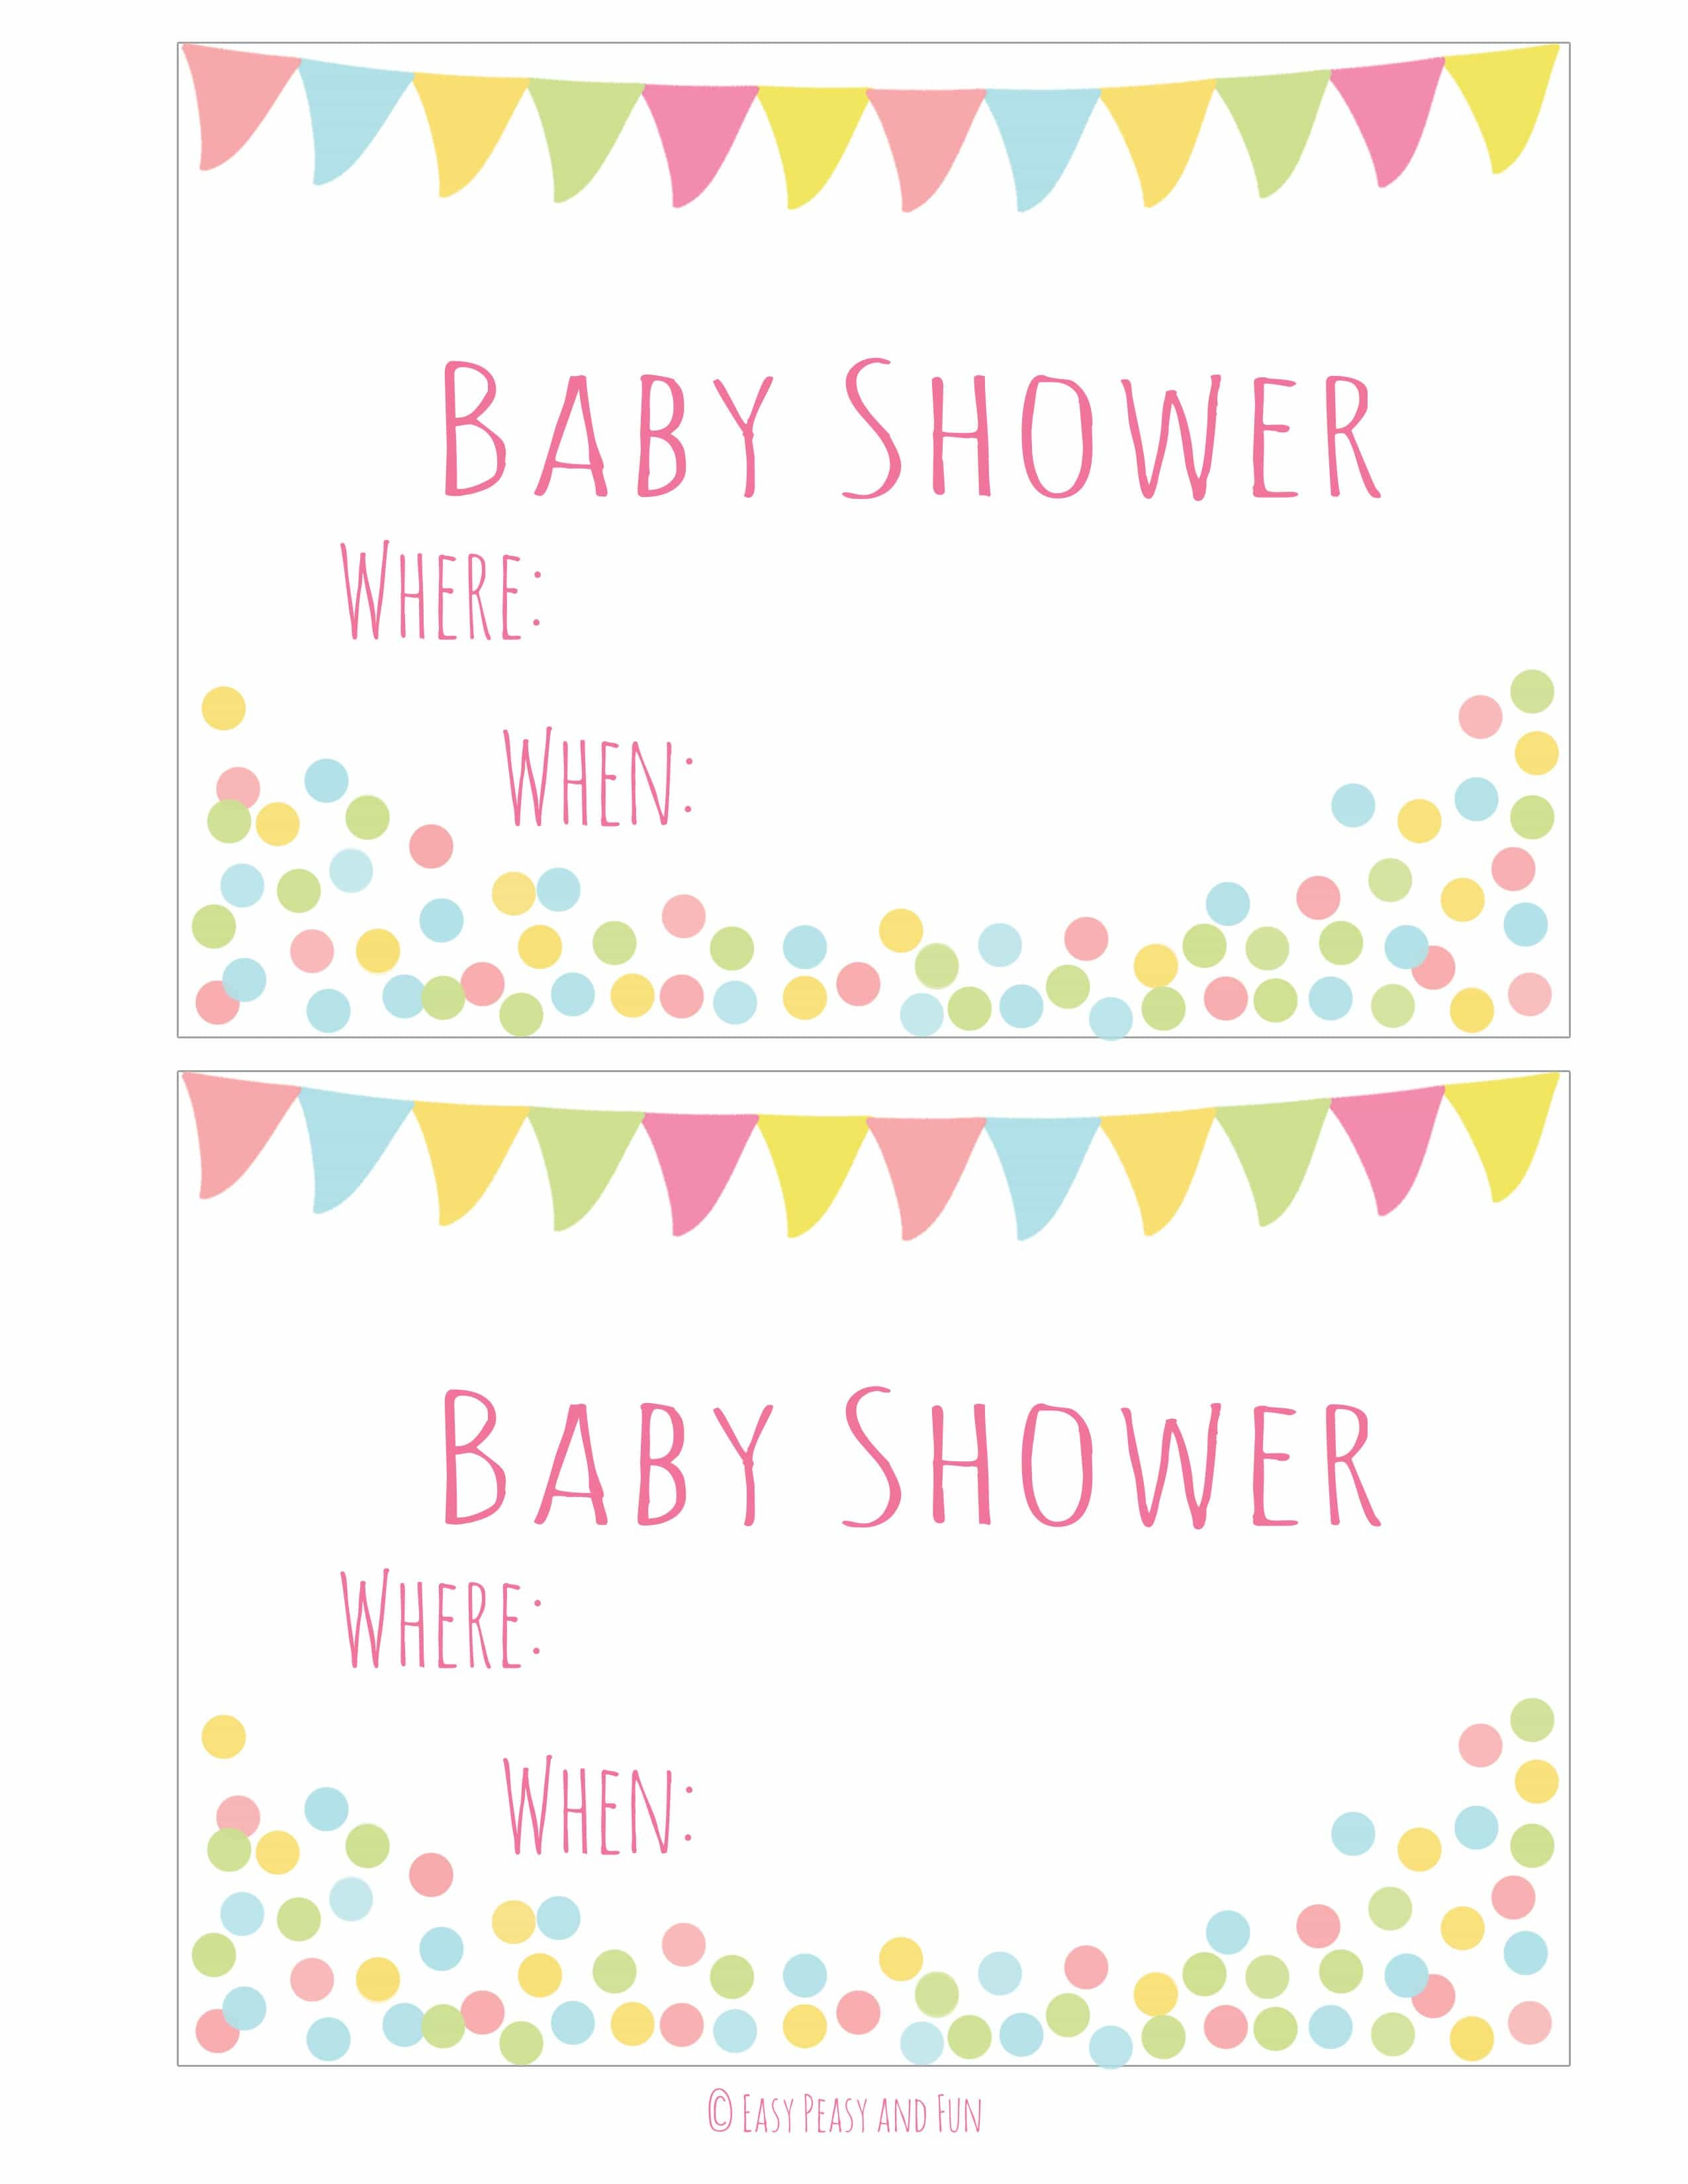 Free Printable Baby Shower Invitation - Easy Peasy And Fun - Free Printable Baby Shower Invitations For Girls